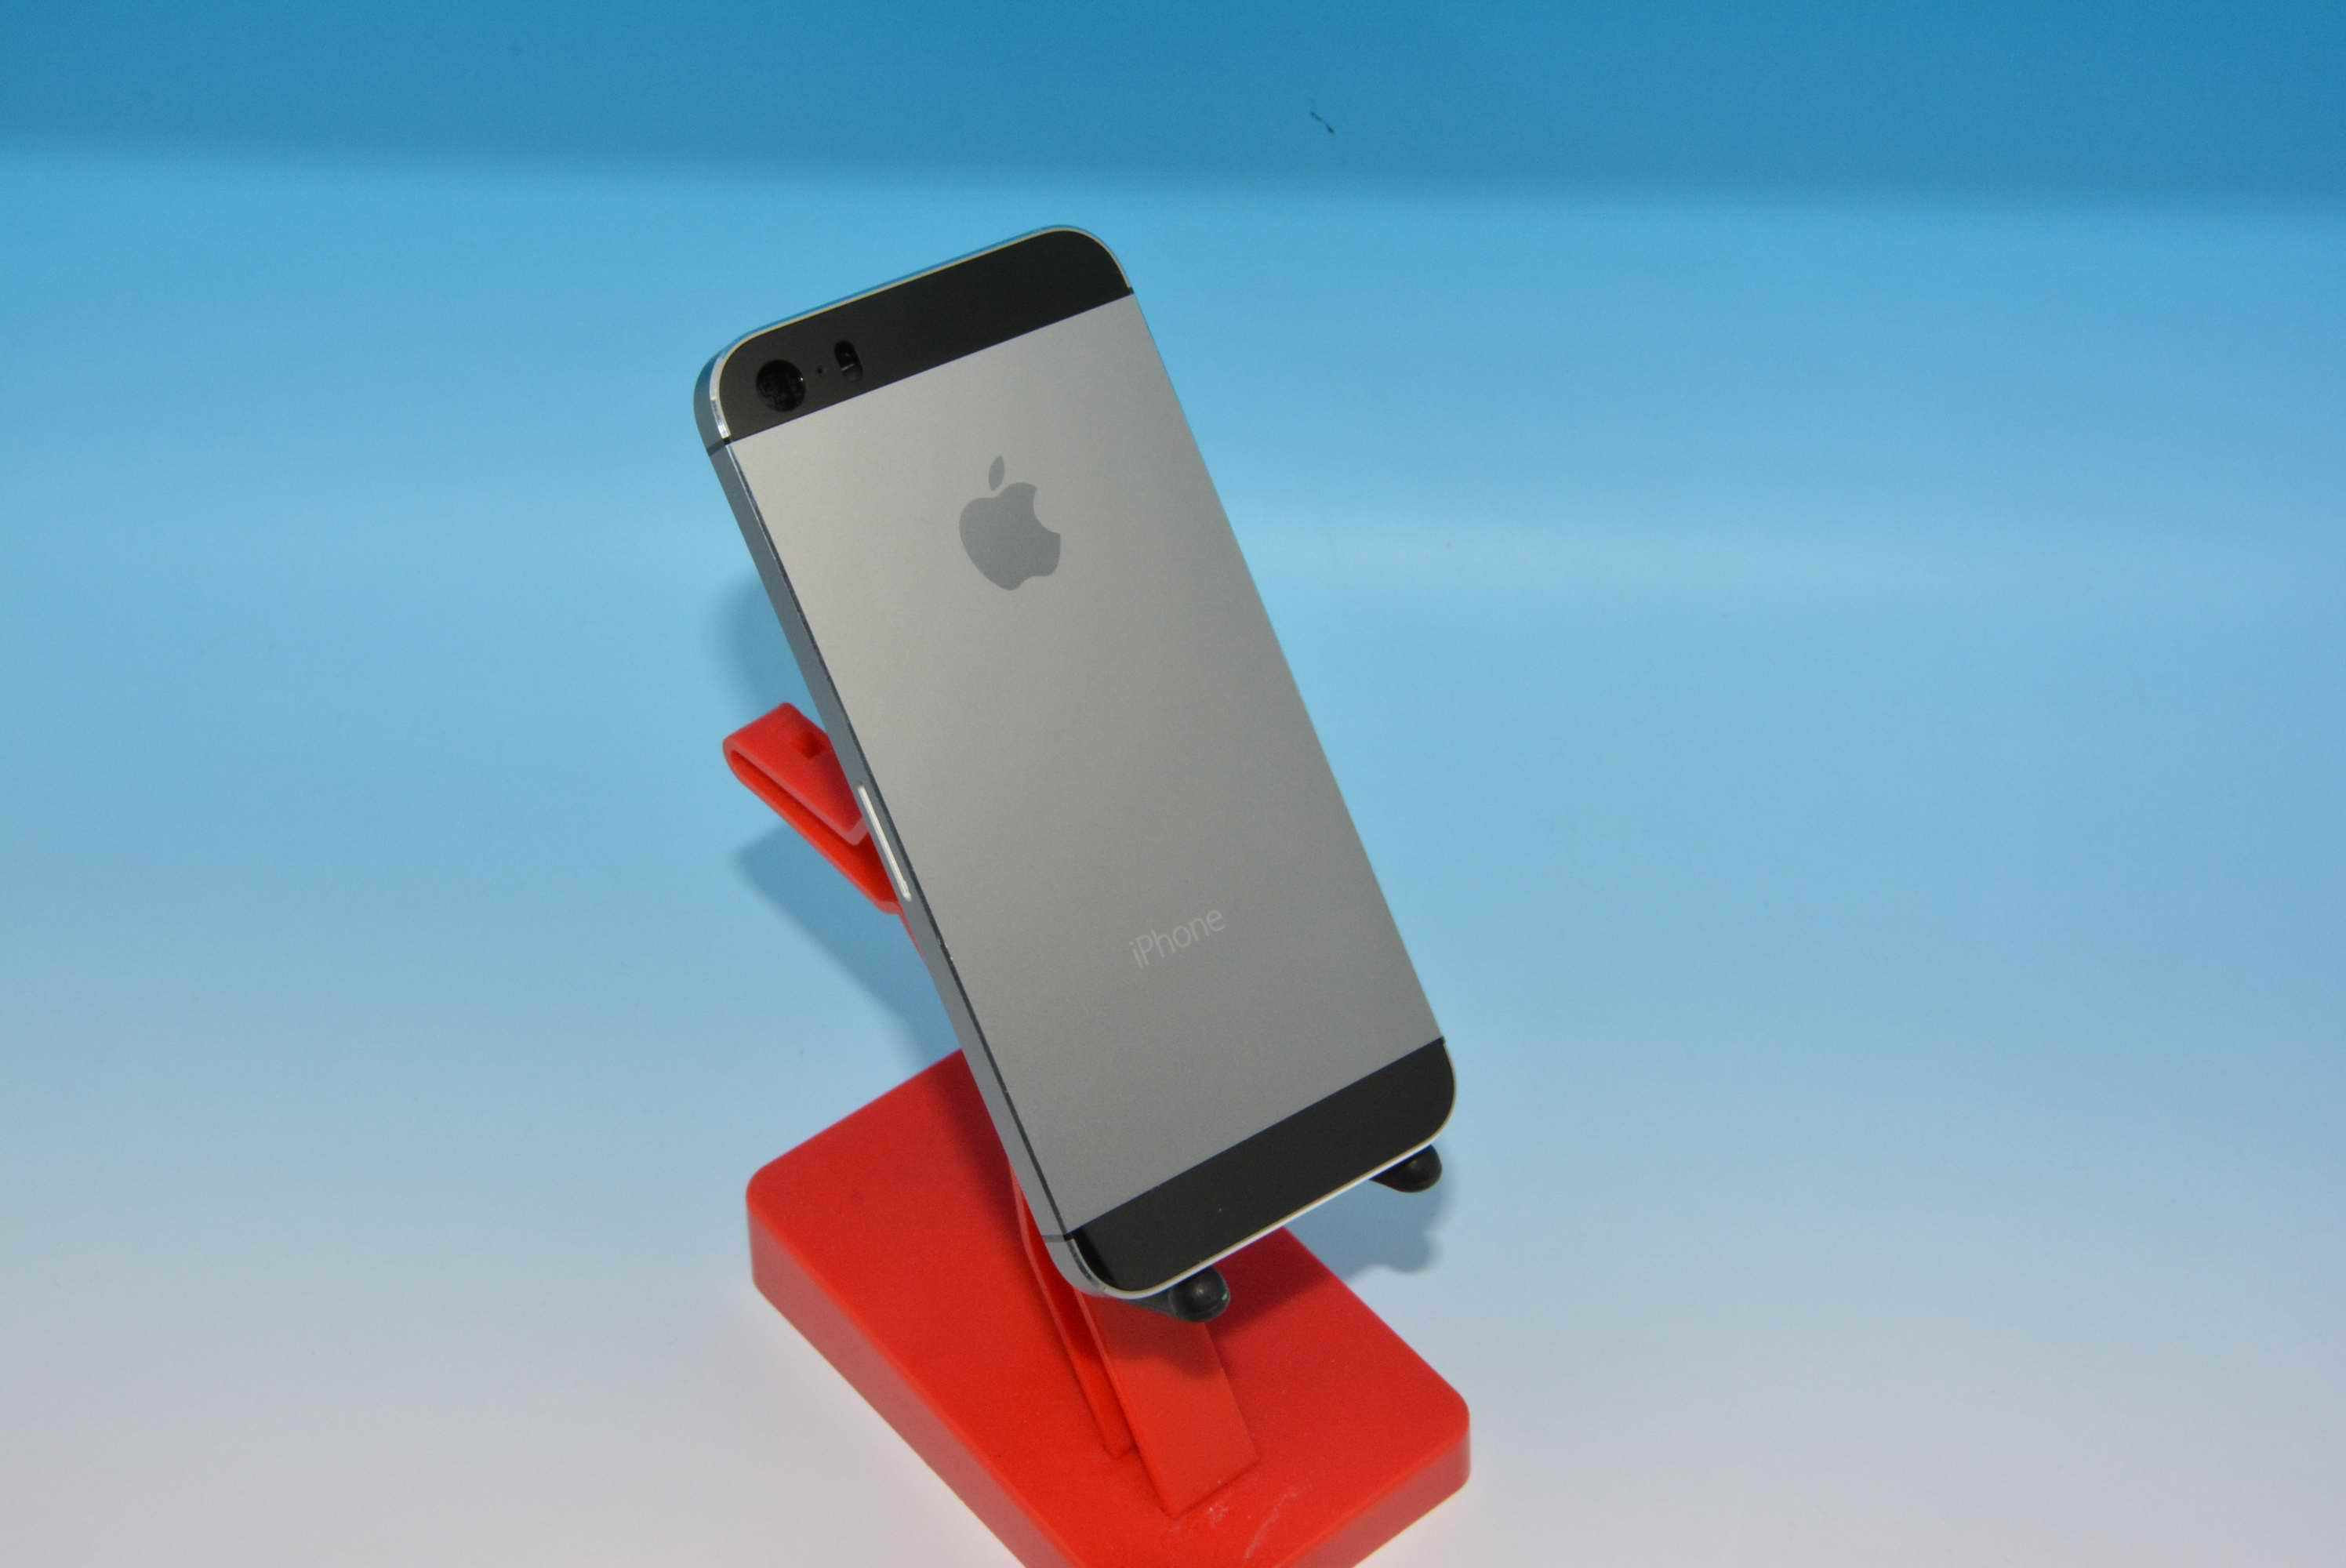 Fotos: iPhone 5S in graphit & grau (Neue Farbe!) 7